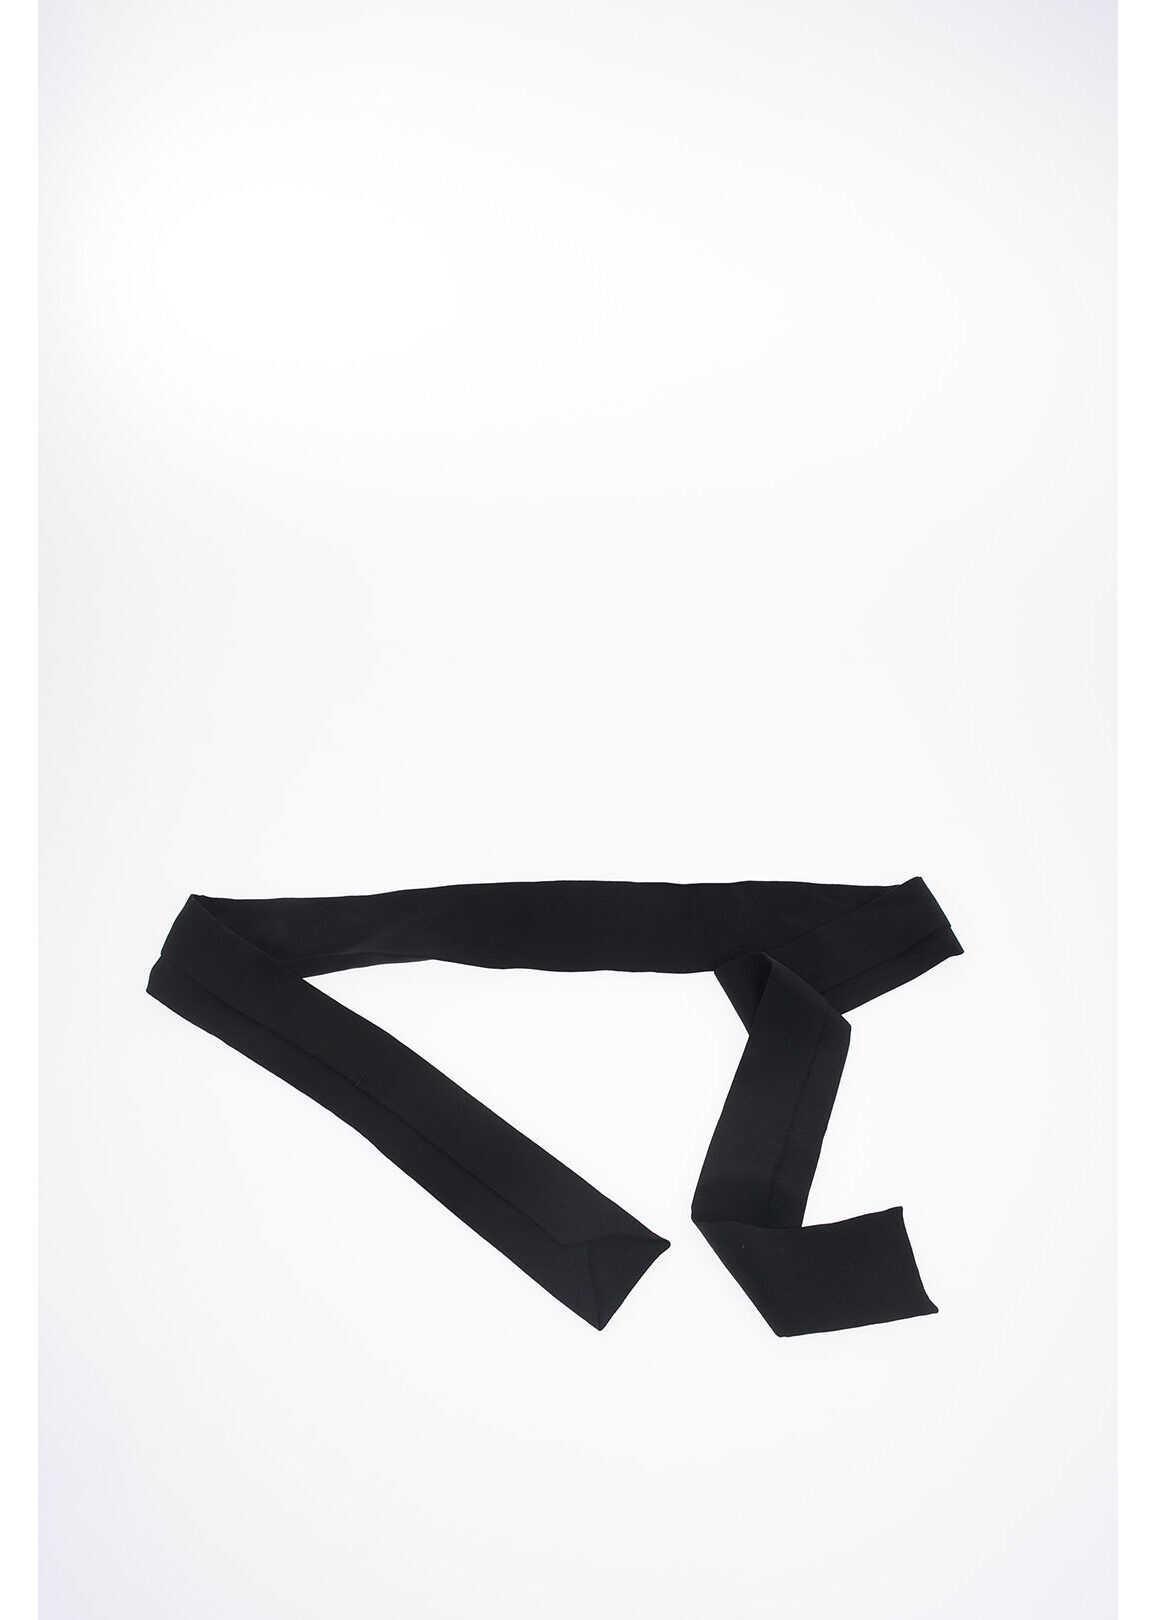 Prada Silk Neckerchief BLACK